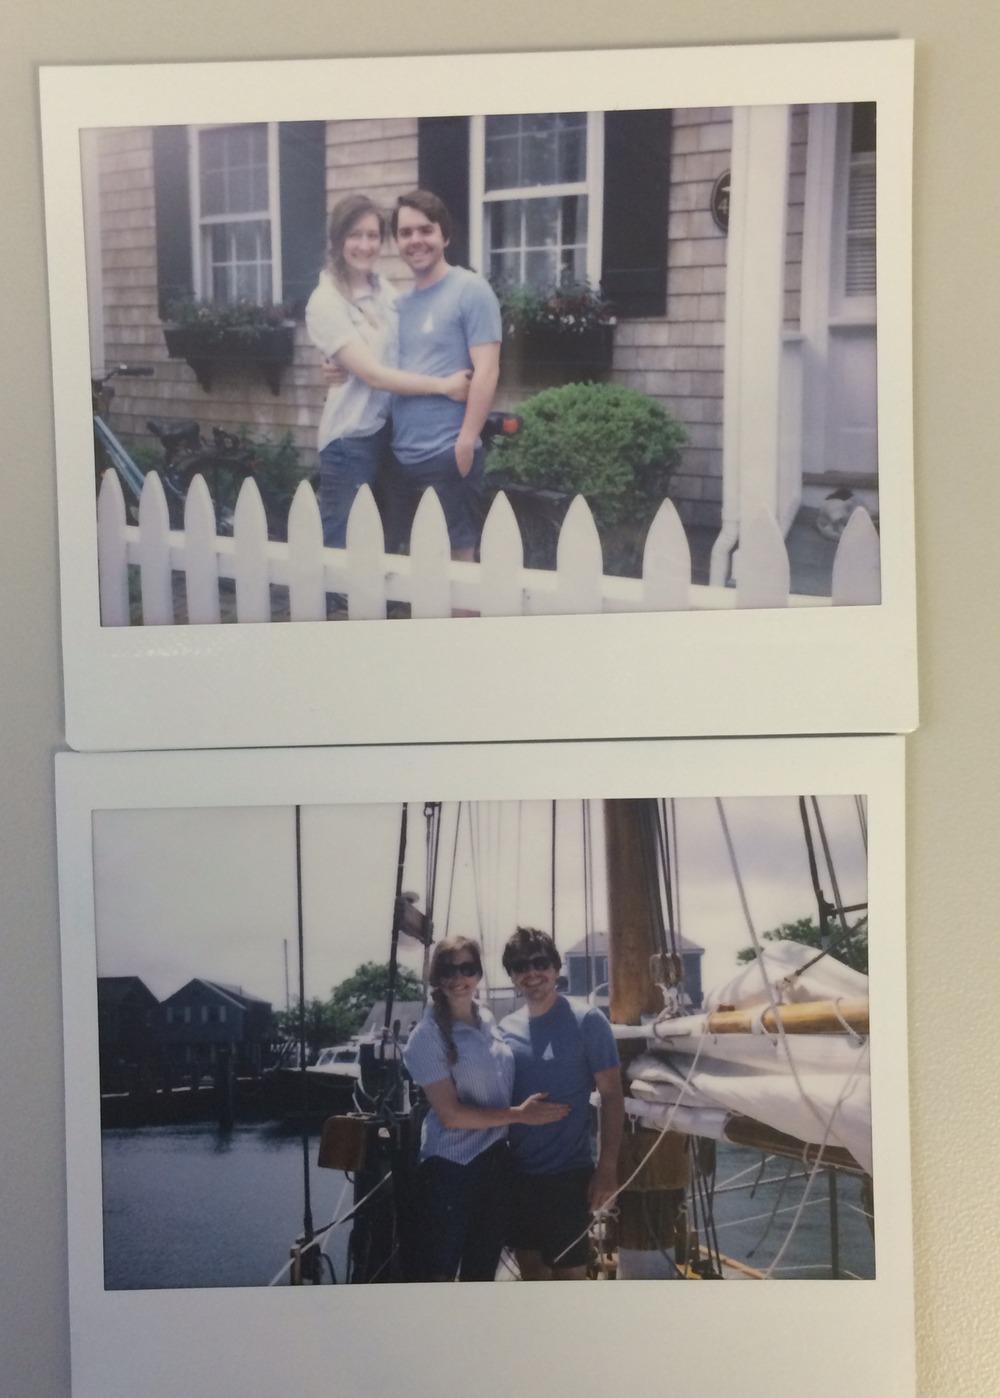 Polaroids for days. Love him.